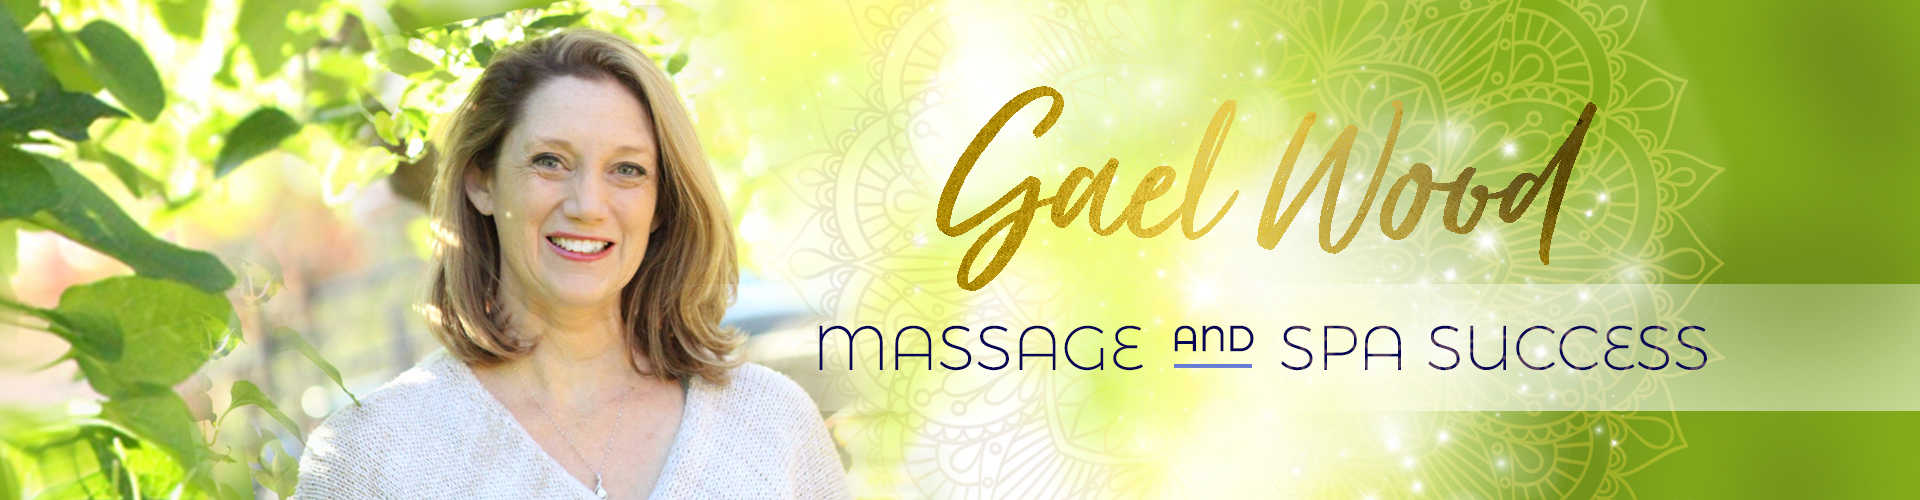 Gael Wood Massage and Spa Success